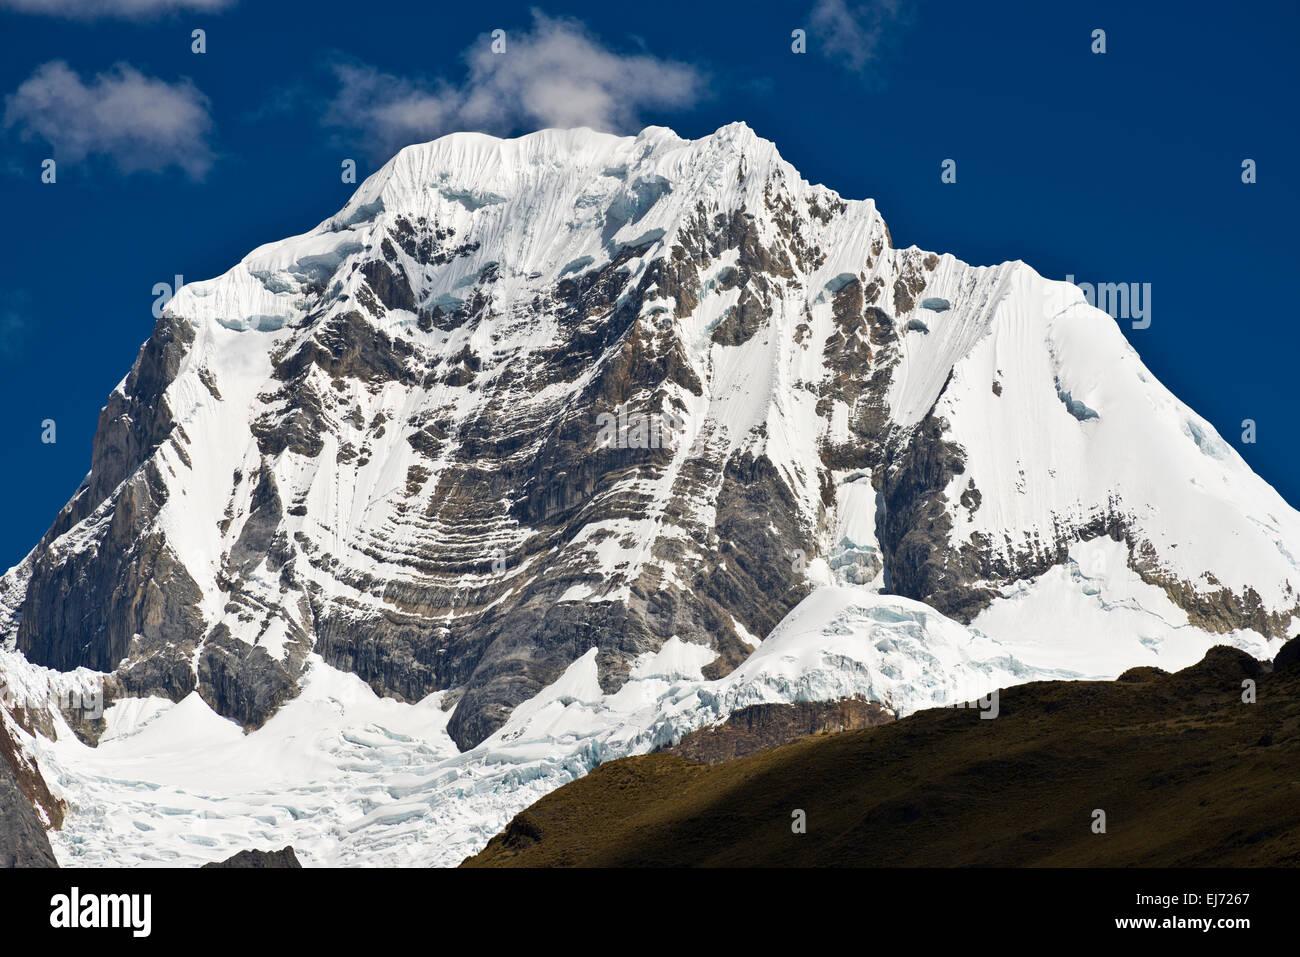 Snowy mountain Siula Grande, Cordillera Huayhuash mountain range, Andes, northern Peru, Peru - Stock Image